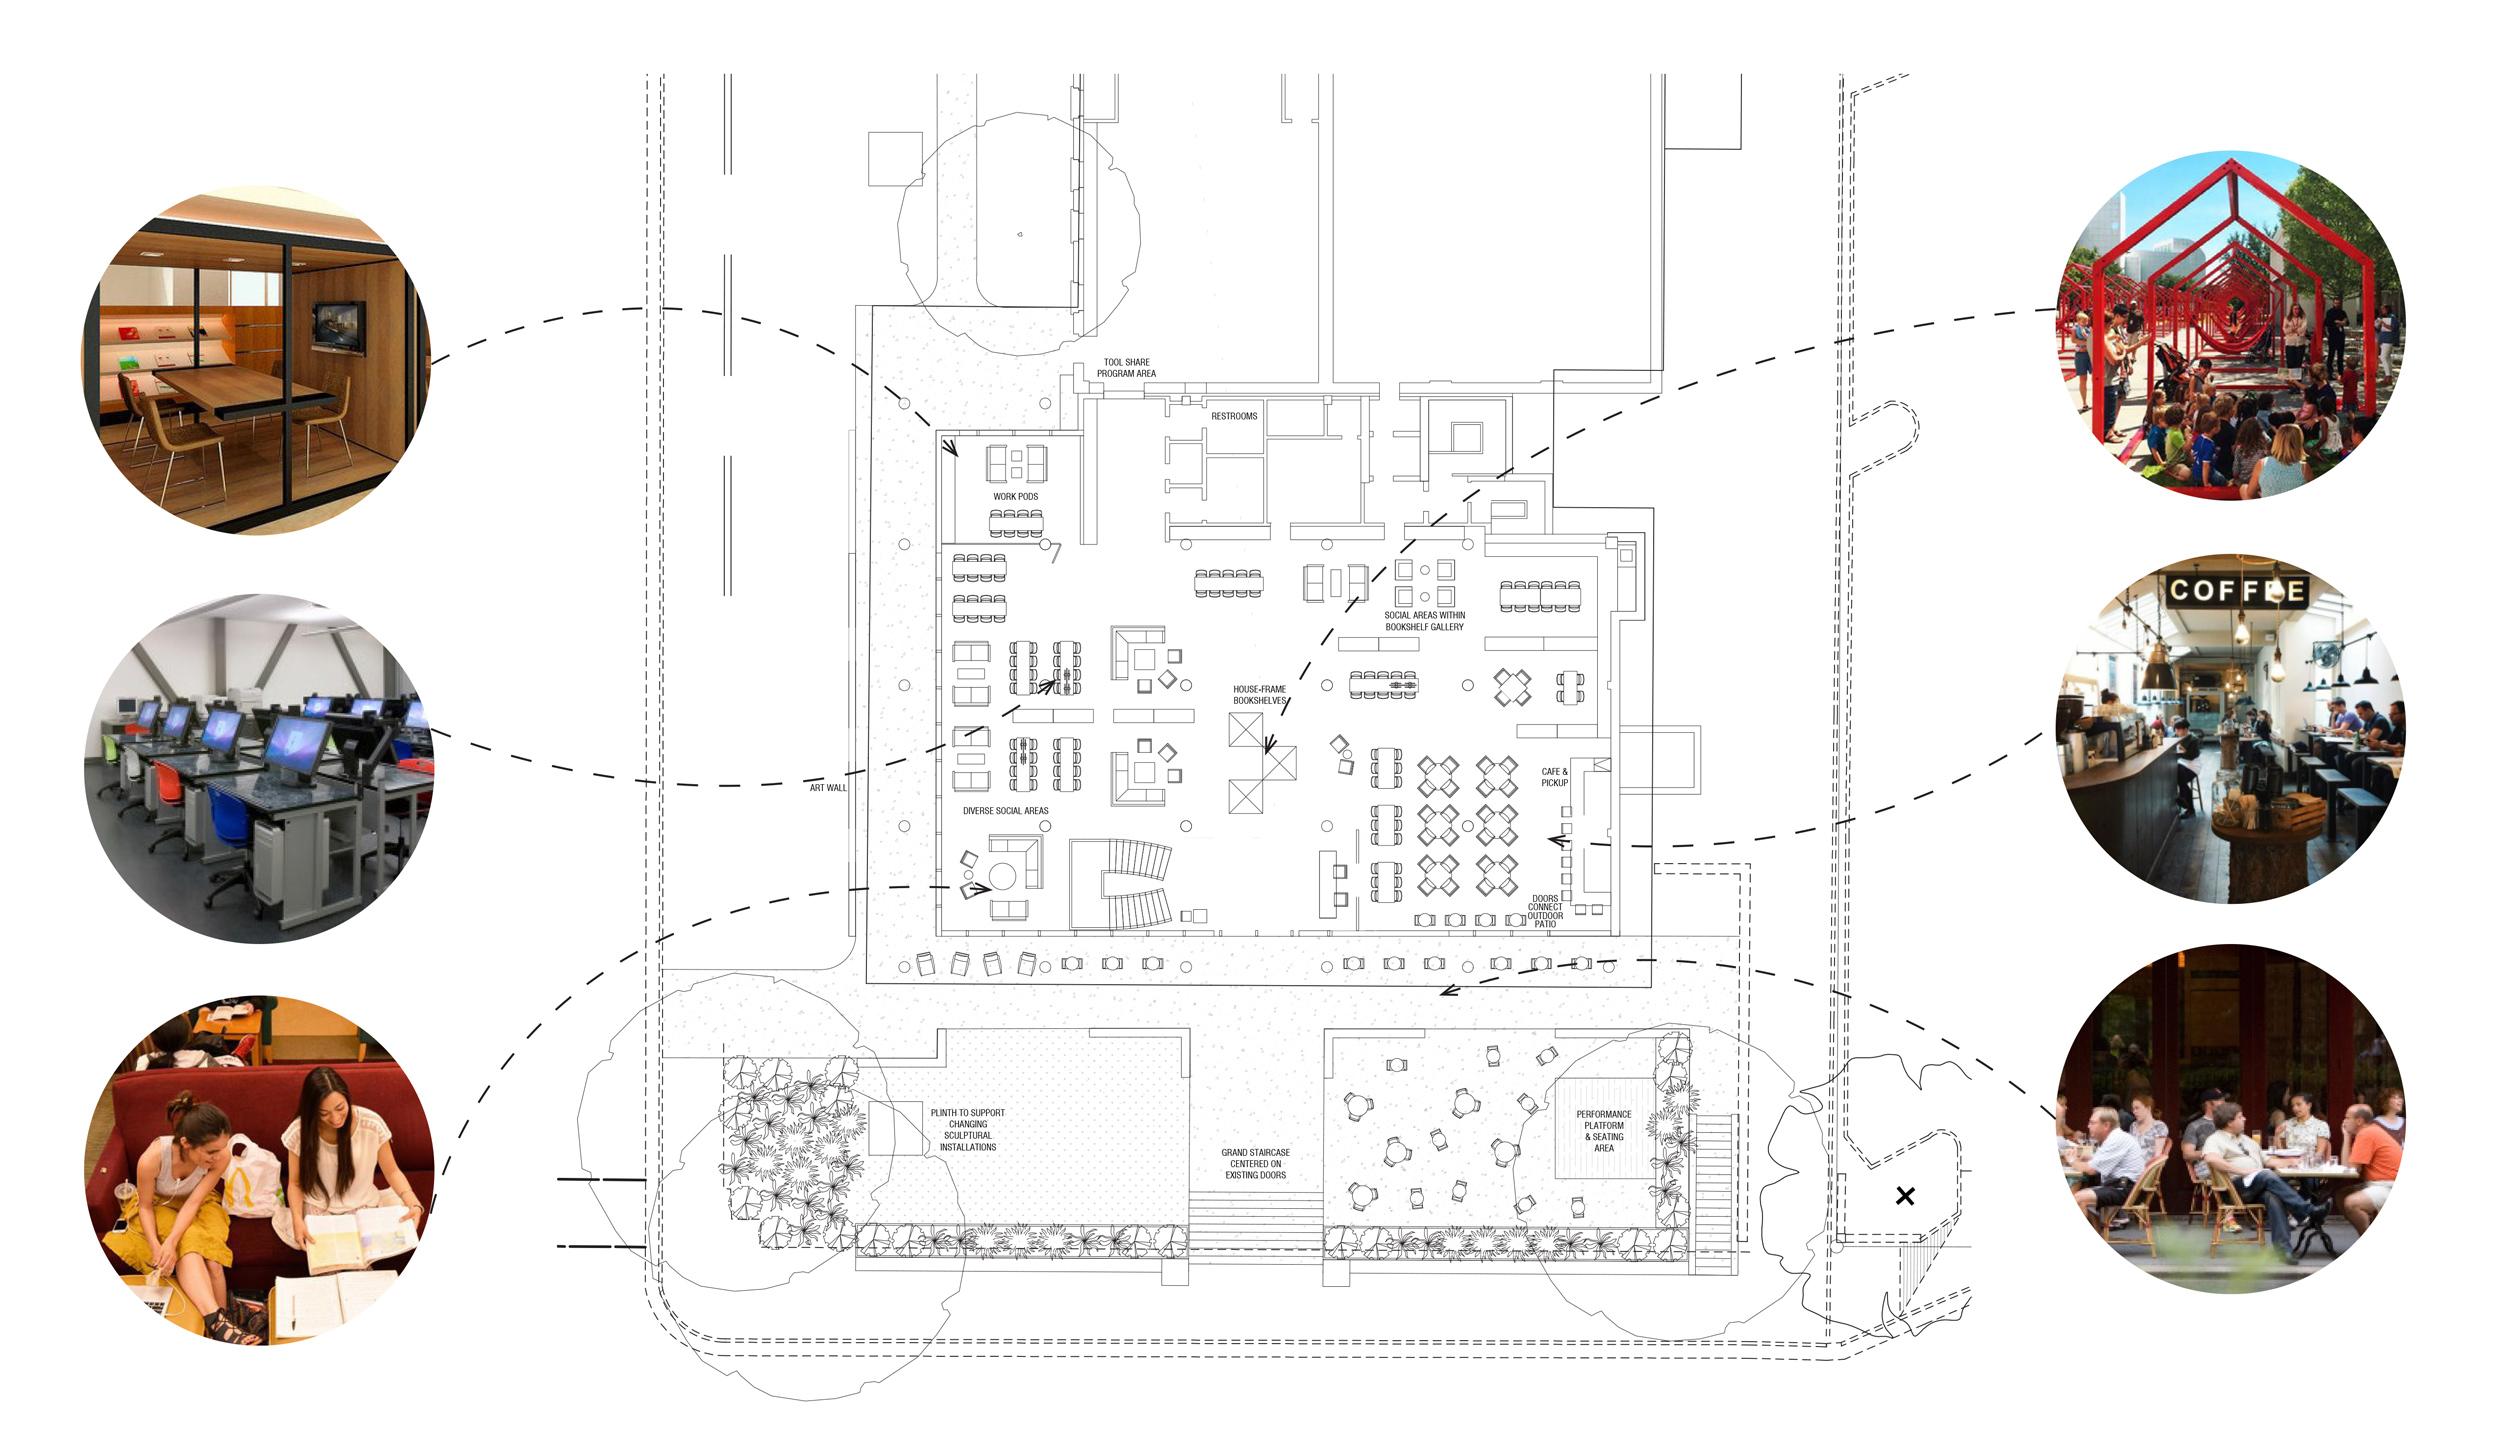 Cossitt-first-floor-site-plan.jpg